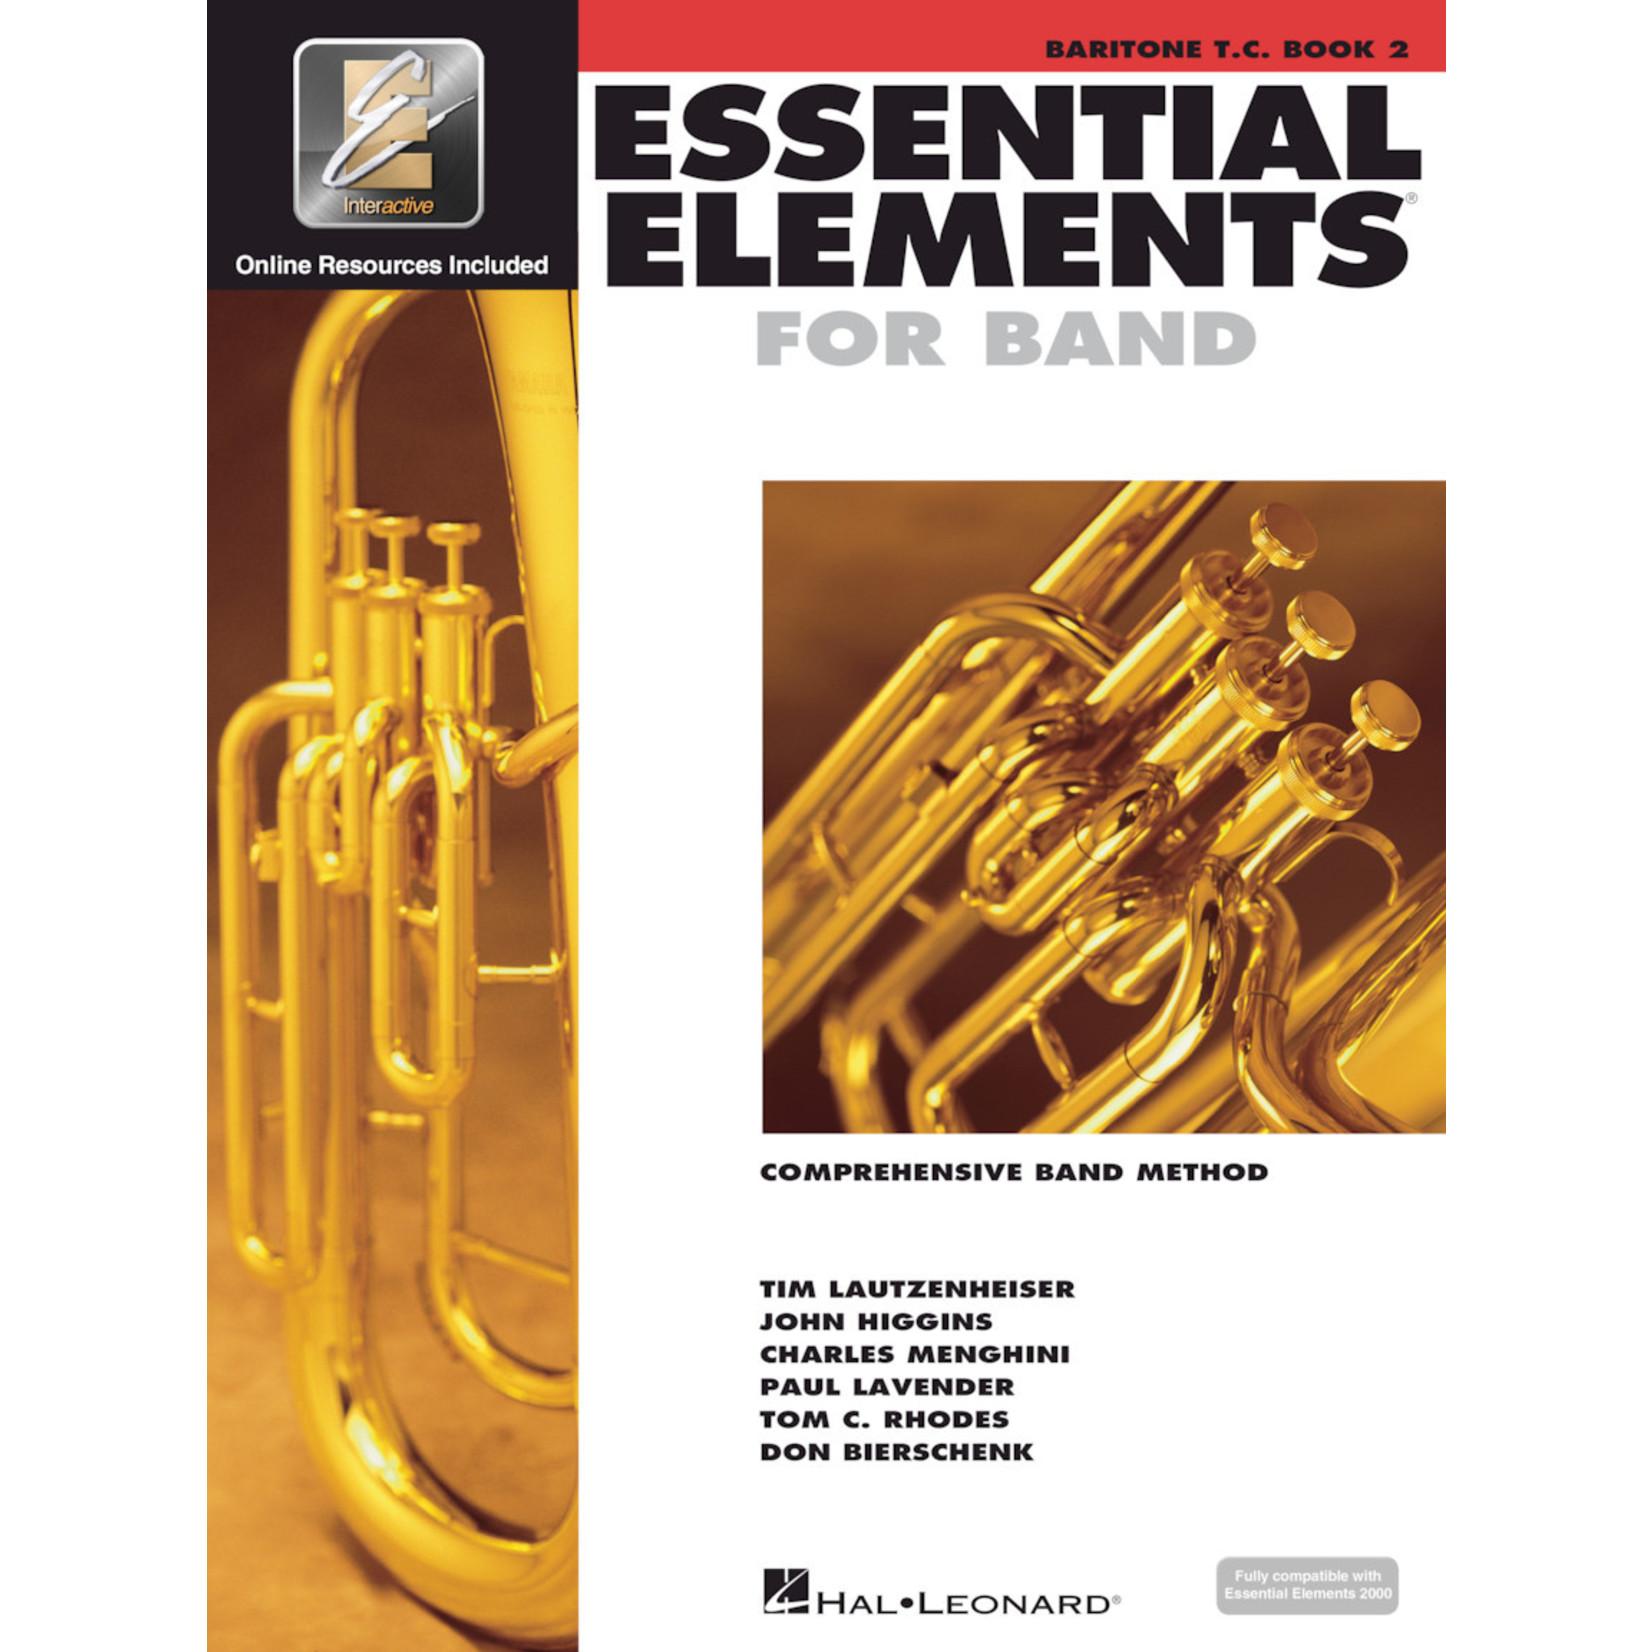 Hal Leonard Essential Elements for Band Baritone Tenor Clef Book 2